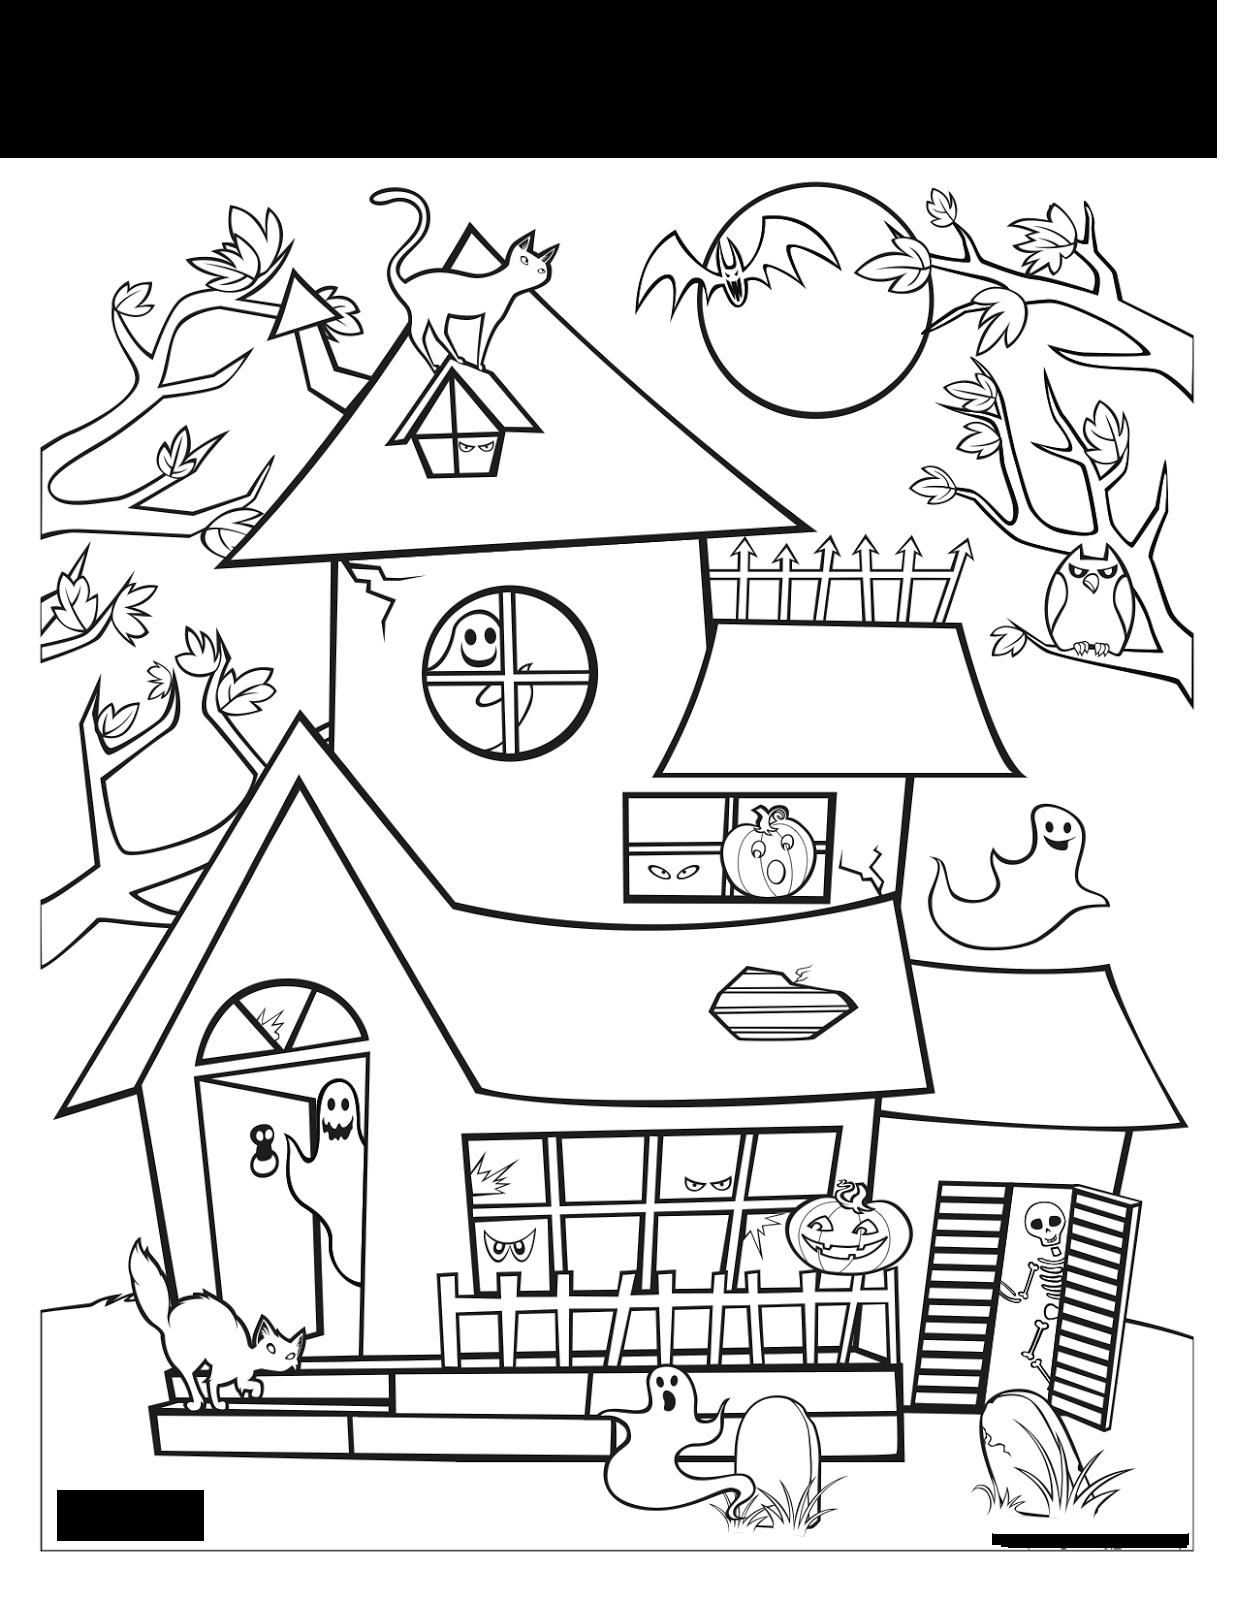 Cantinho do primeiro ciclo desenhos de halloween para pintar for Halloween house coloring pages